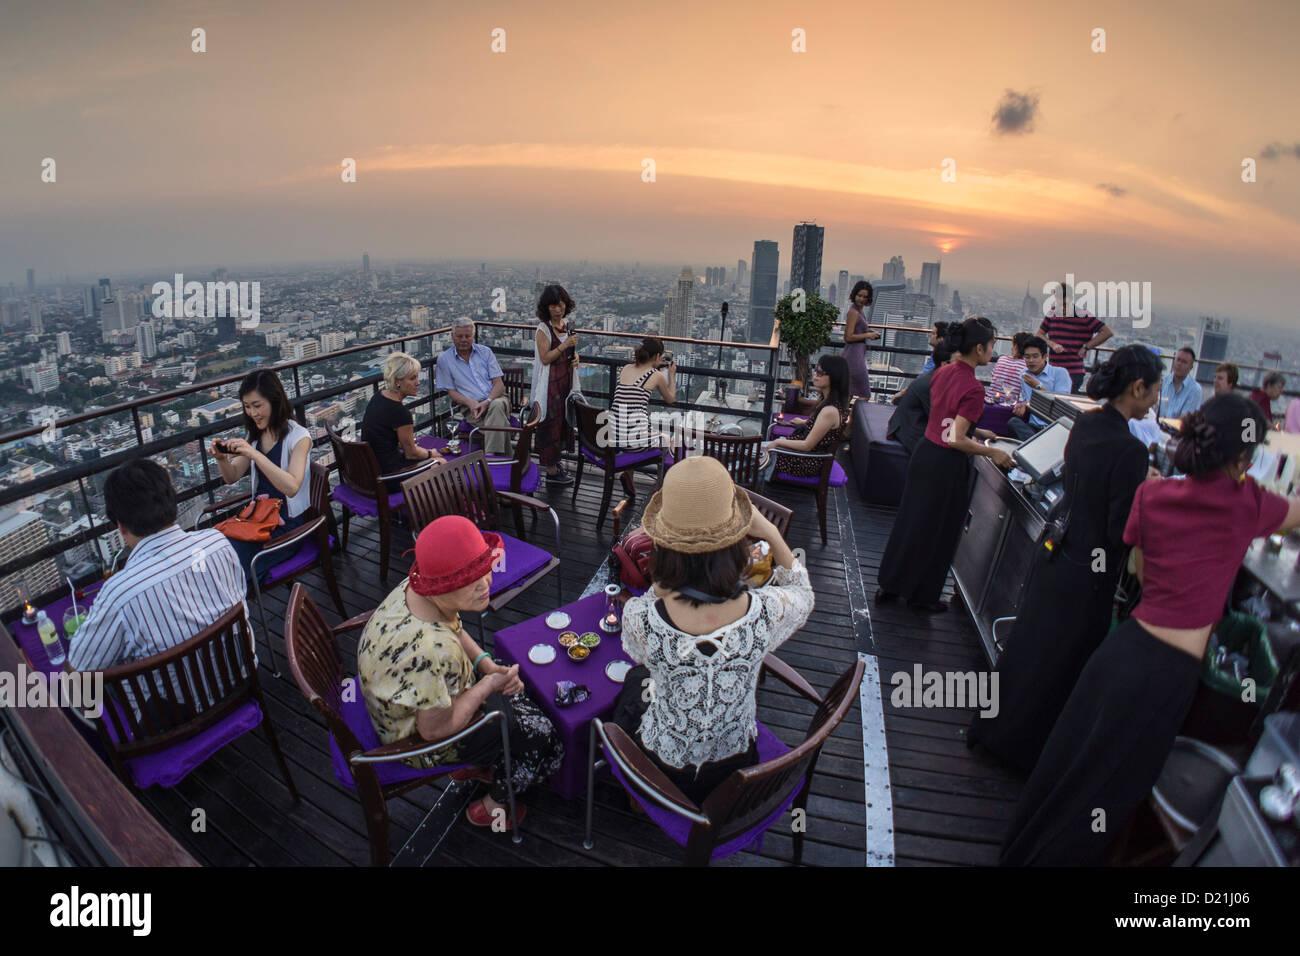 Banyan Tree Rooftop Vertigo and Moon Bar, Restaurant, Bangkok, Thailand - Stock Image